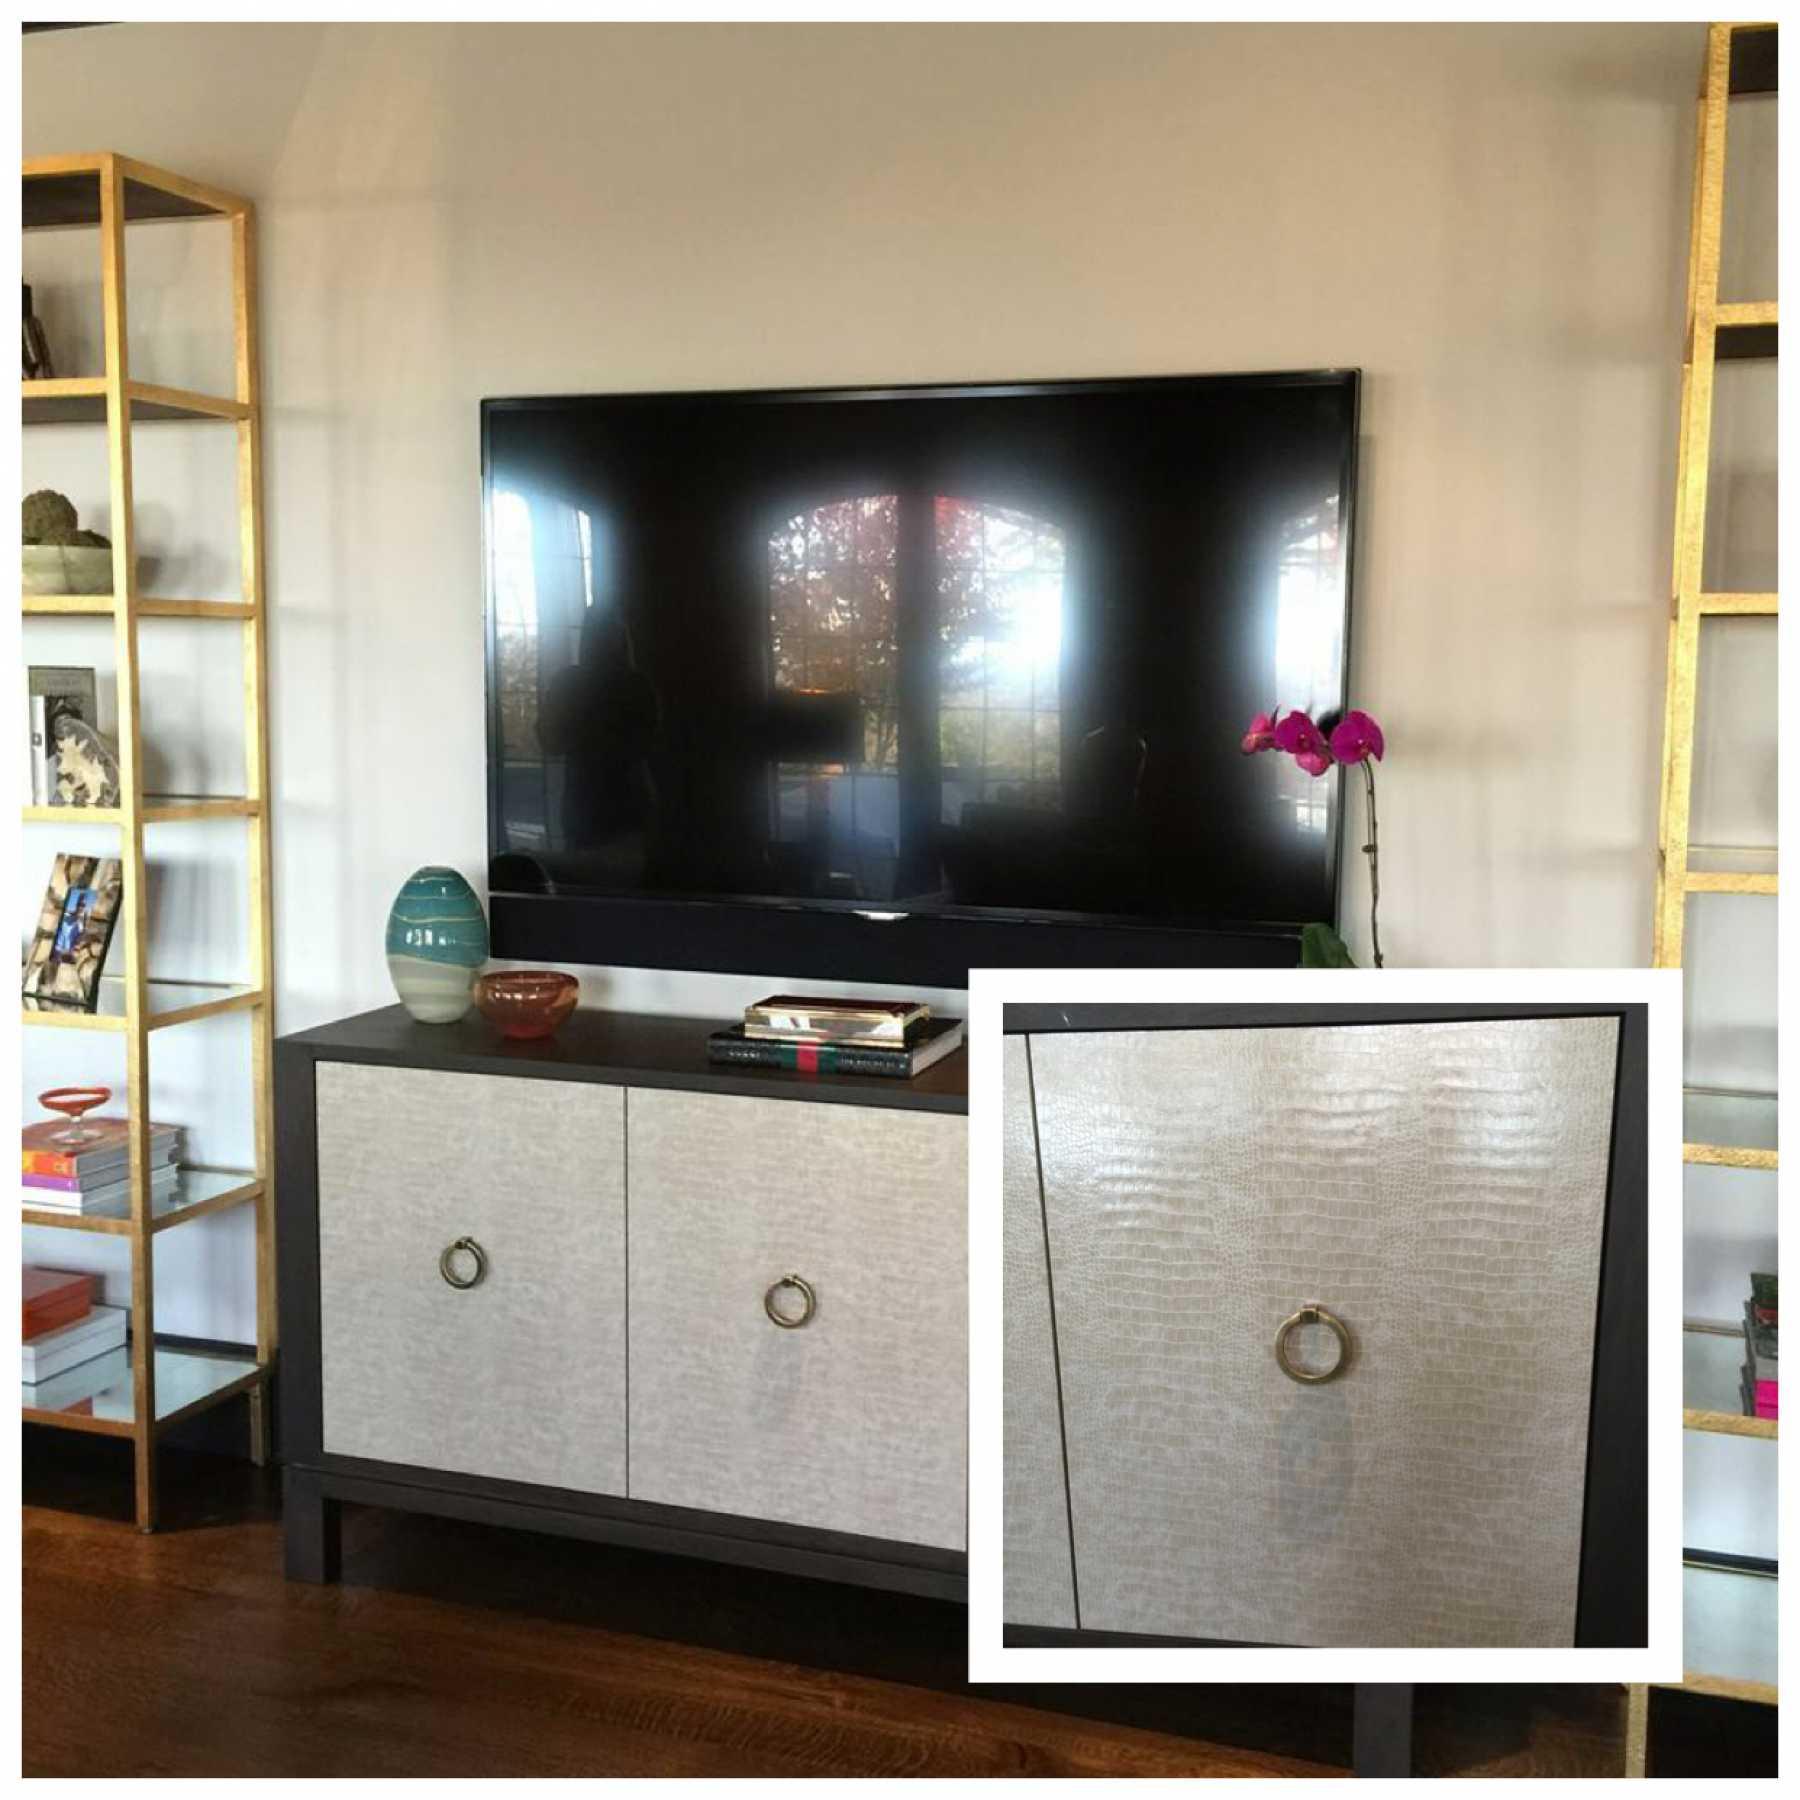 Wallpaper on furniture